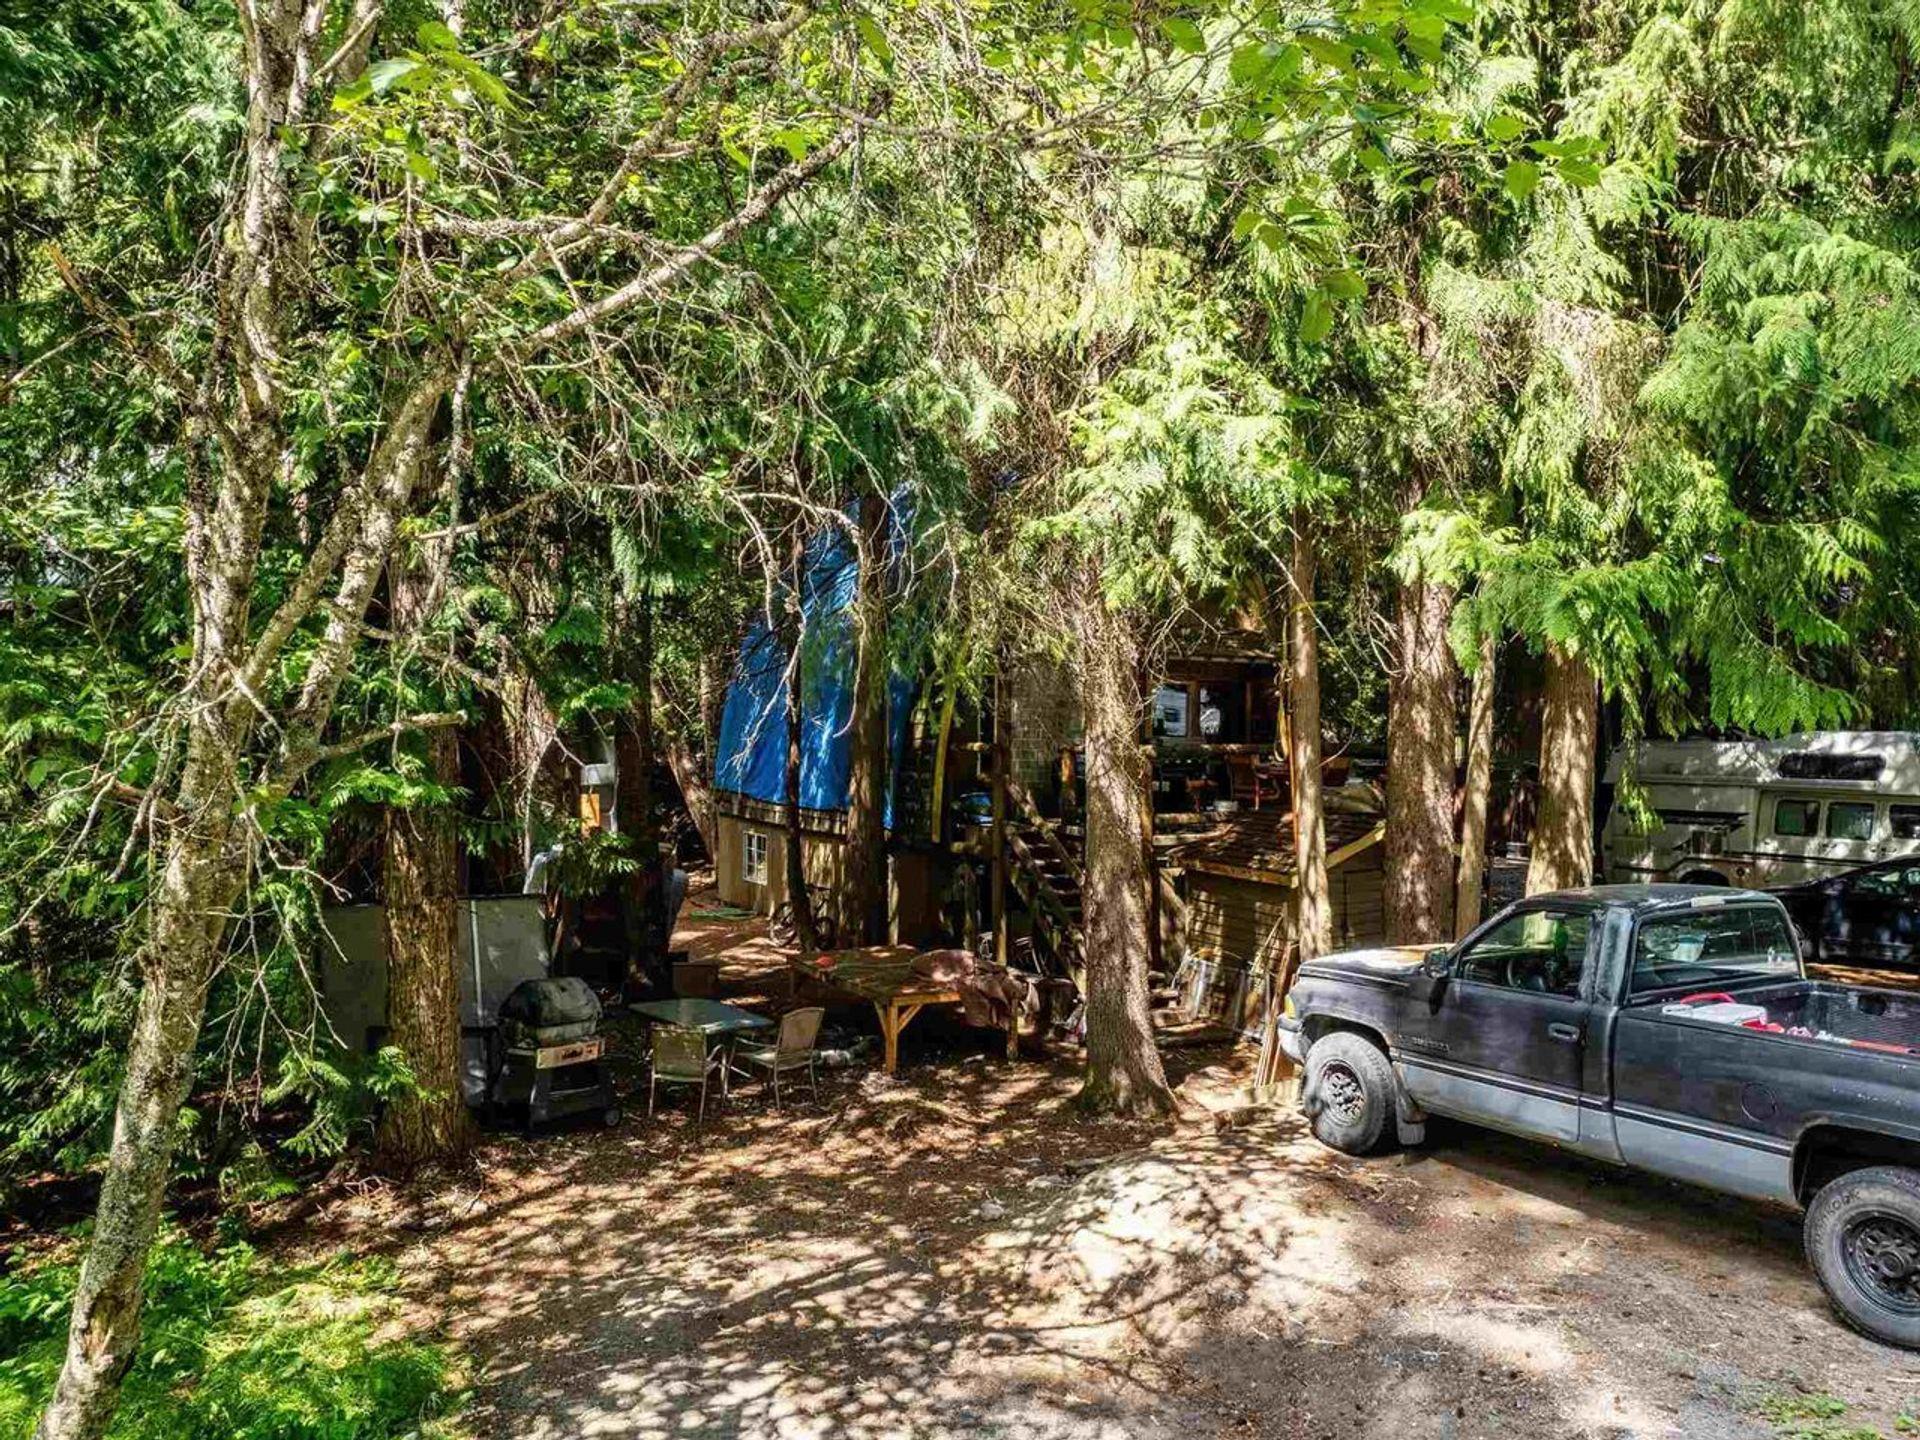 6517-balsam-way-whistler-cay-estates-whistler-17 at 6517 Balsam Way, Whistler Cay Estates, Whistler